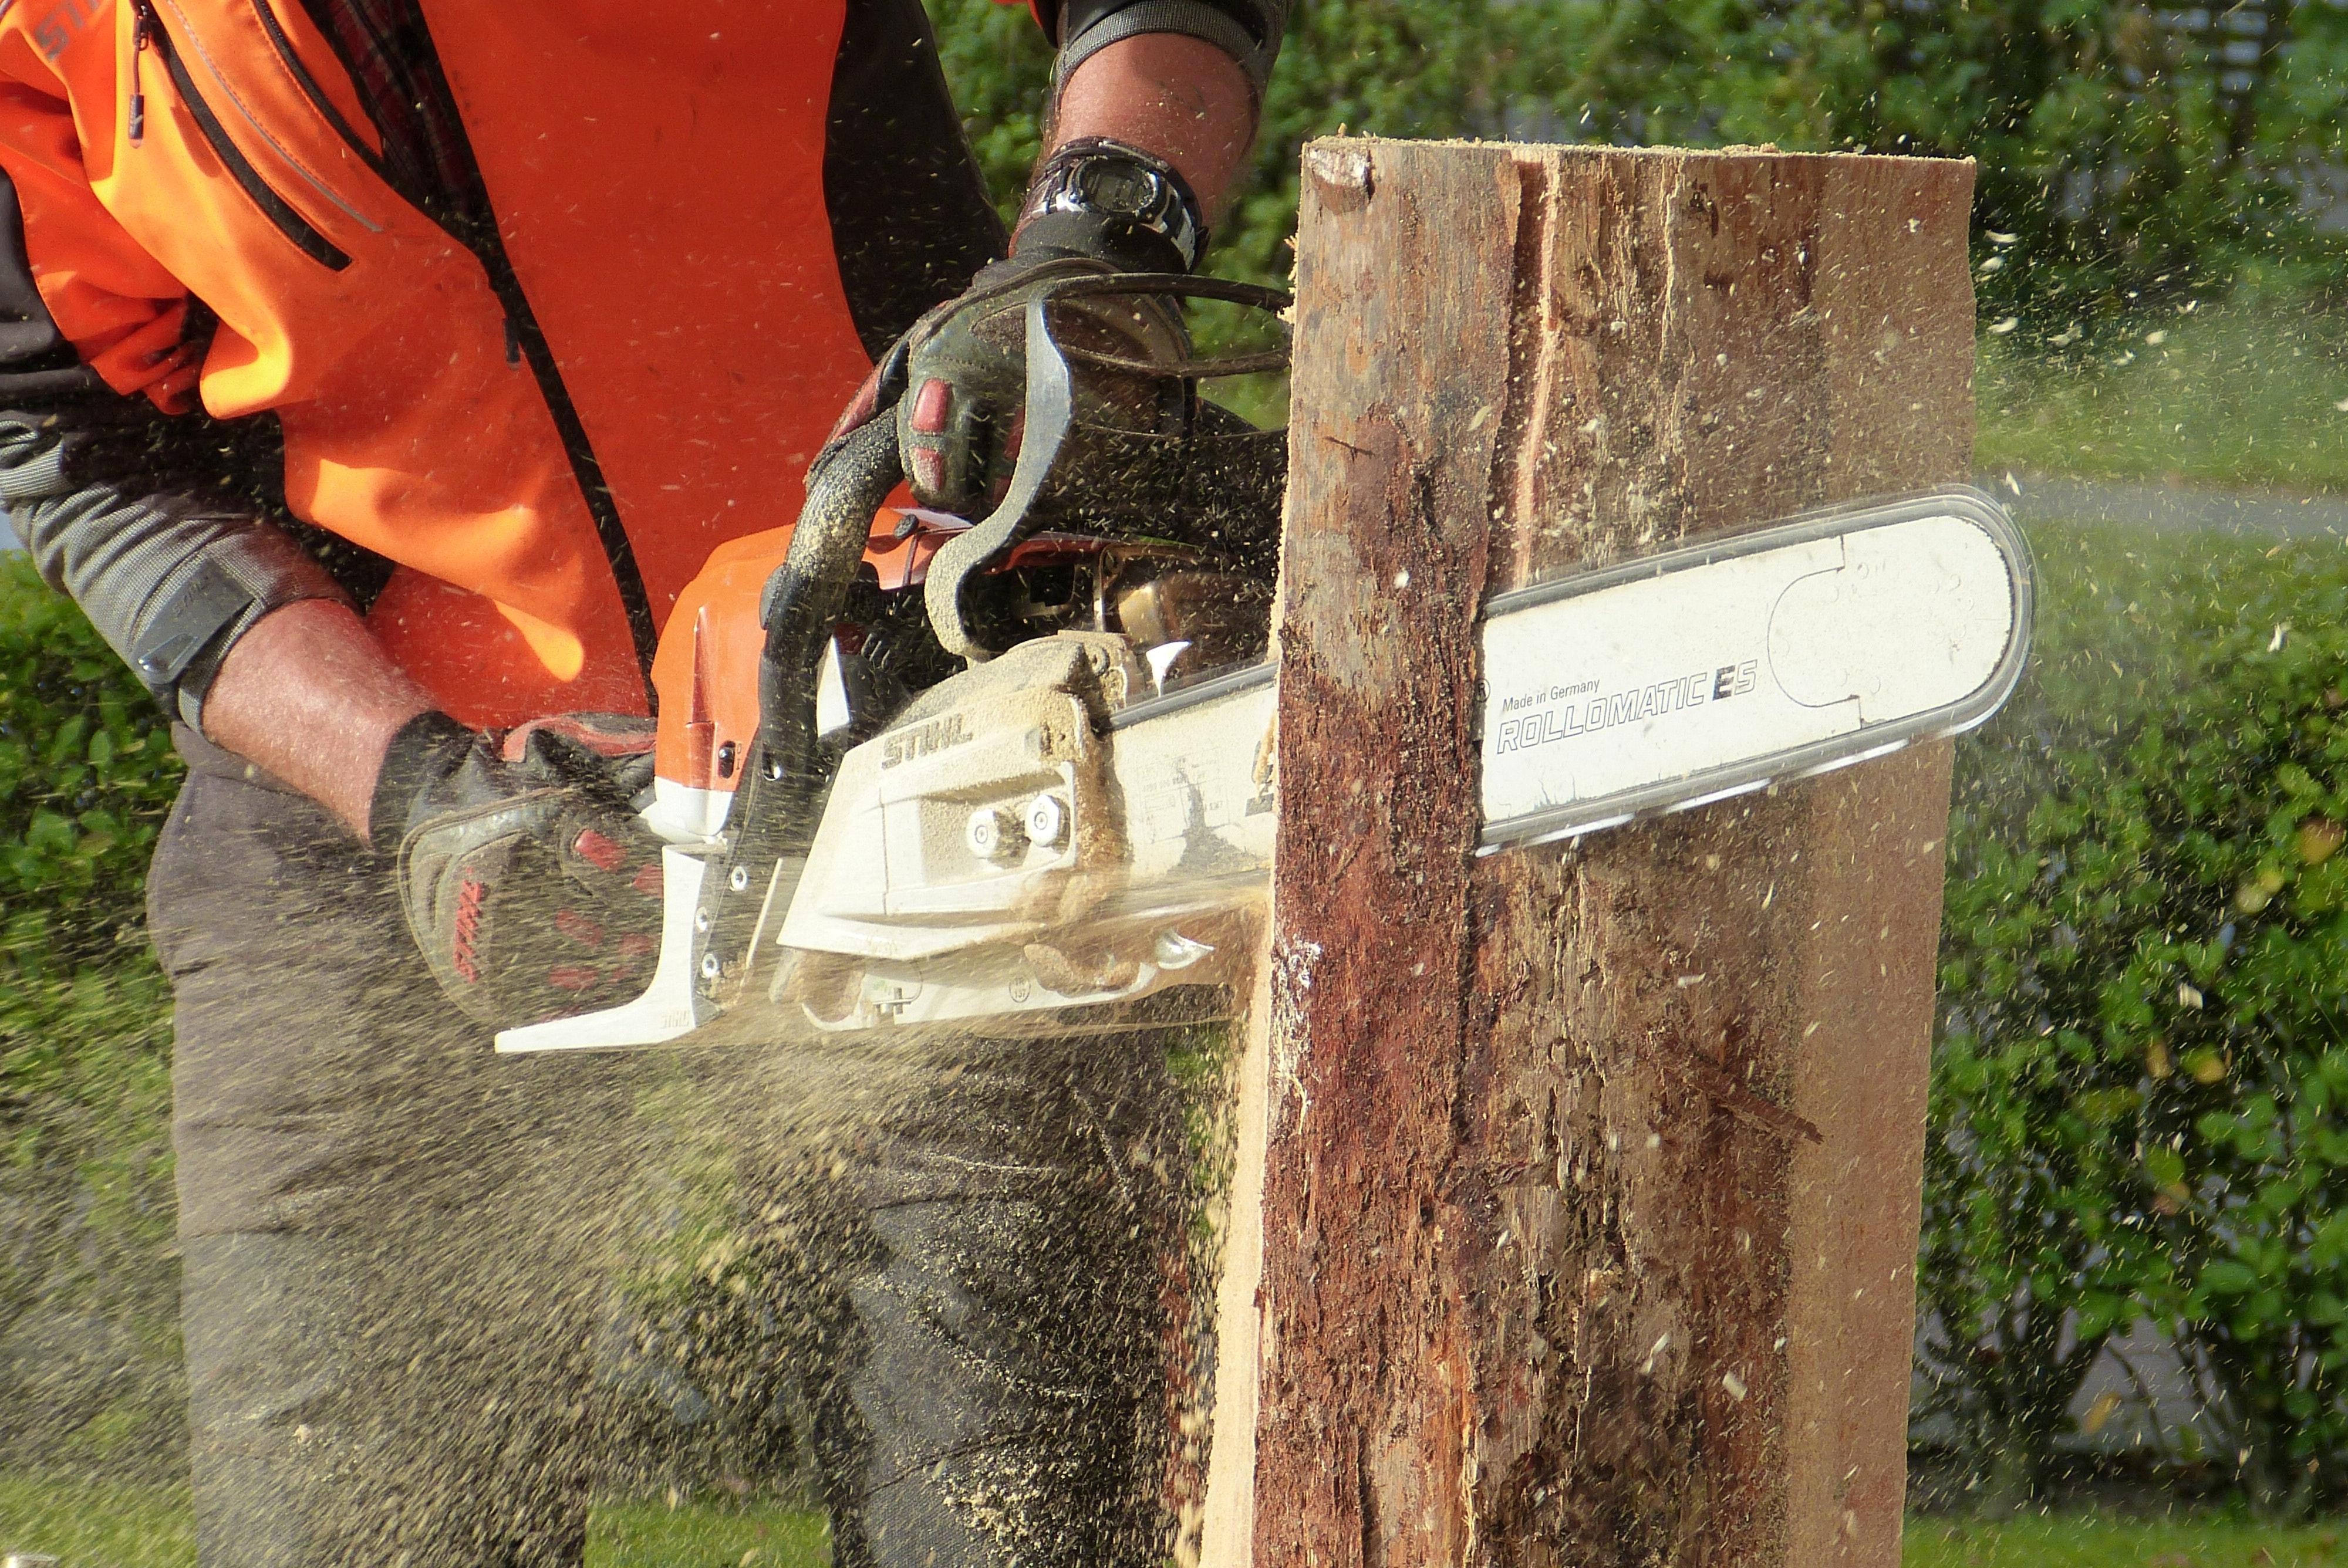 Basic Chainsaw Operation, Safety & Maintenance